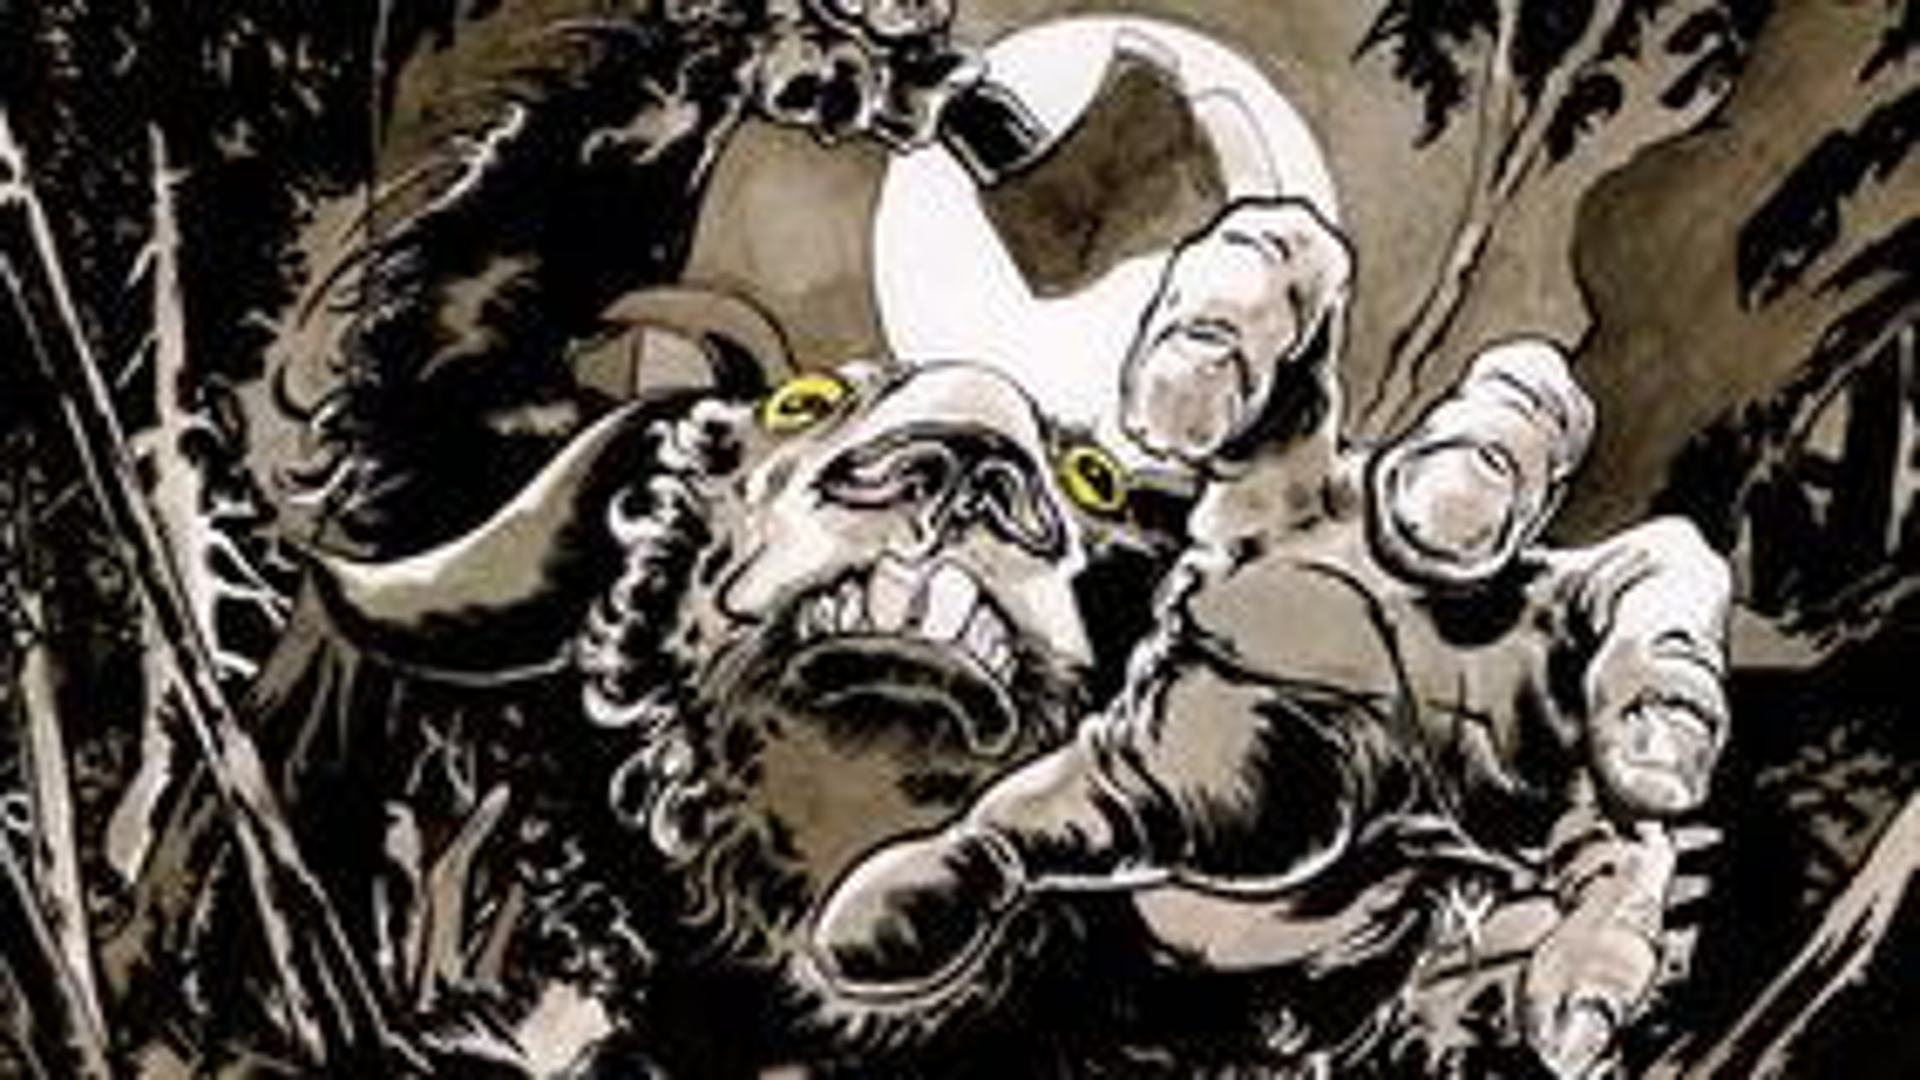 Dark Places and Demogorgons RPG artwork